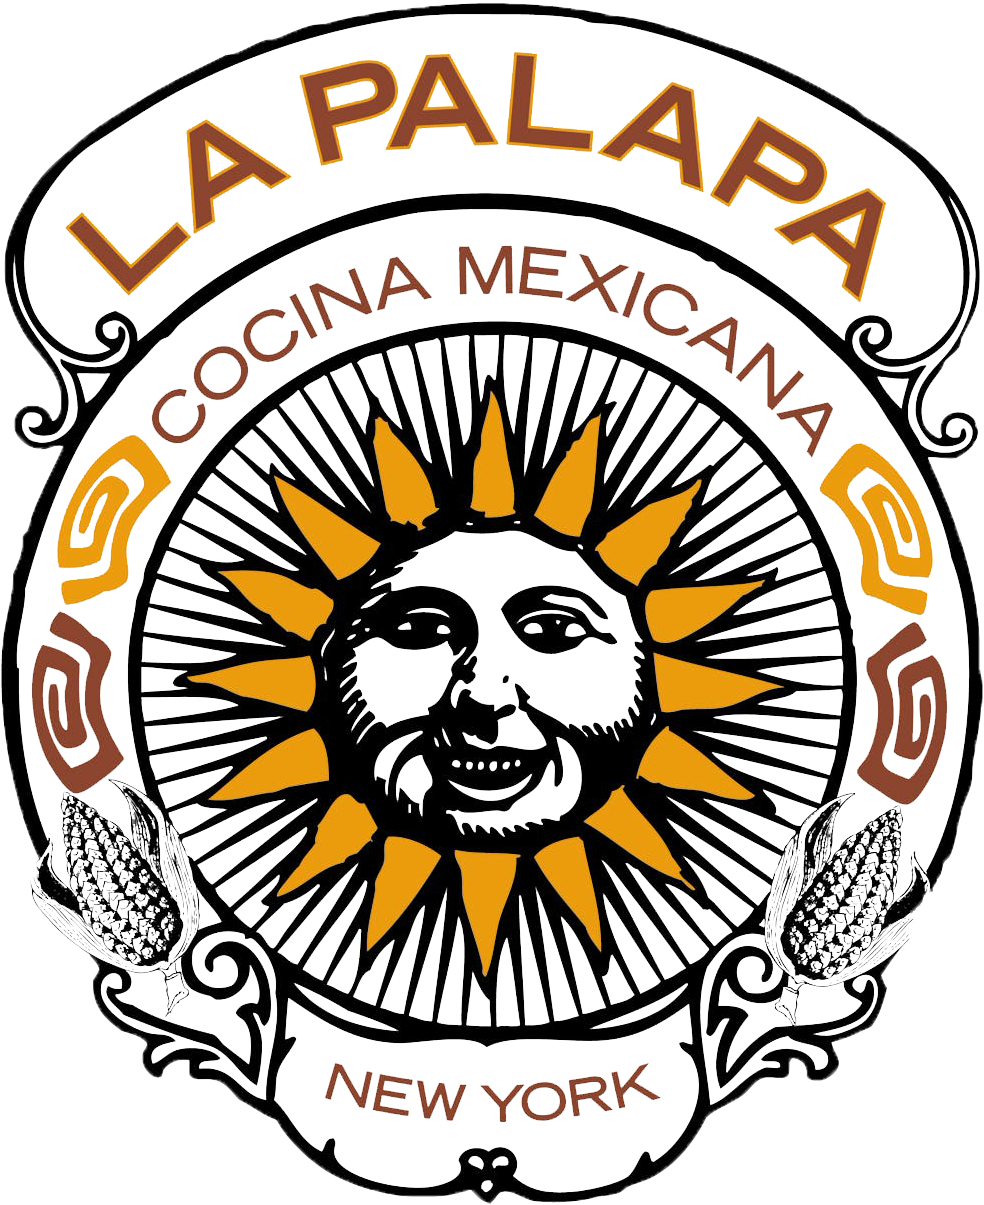 La Palapa Cocina Mexicana